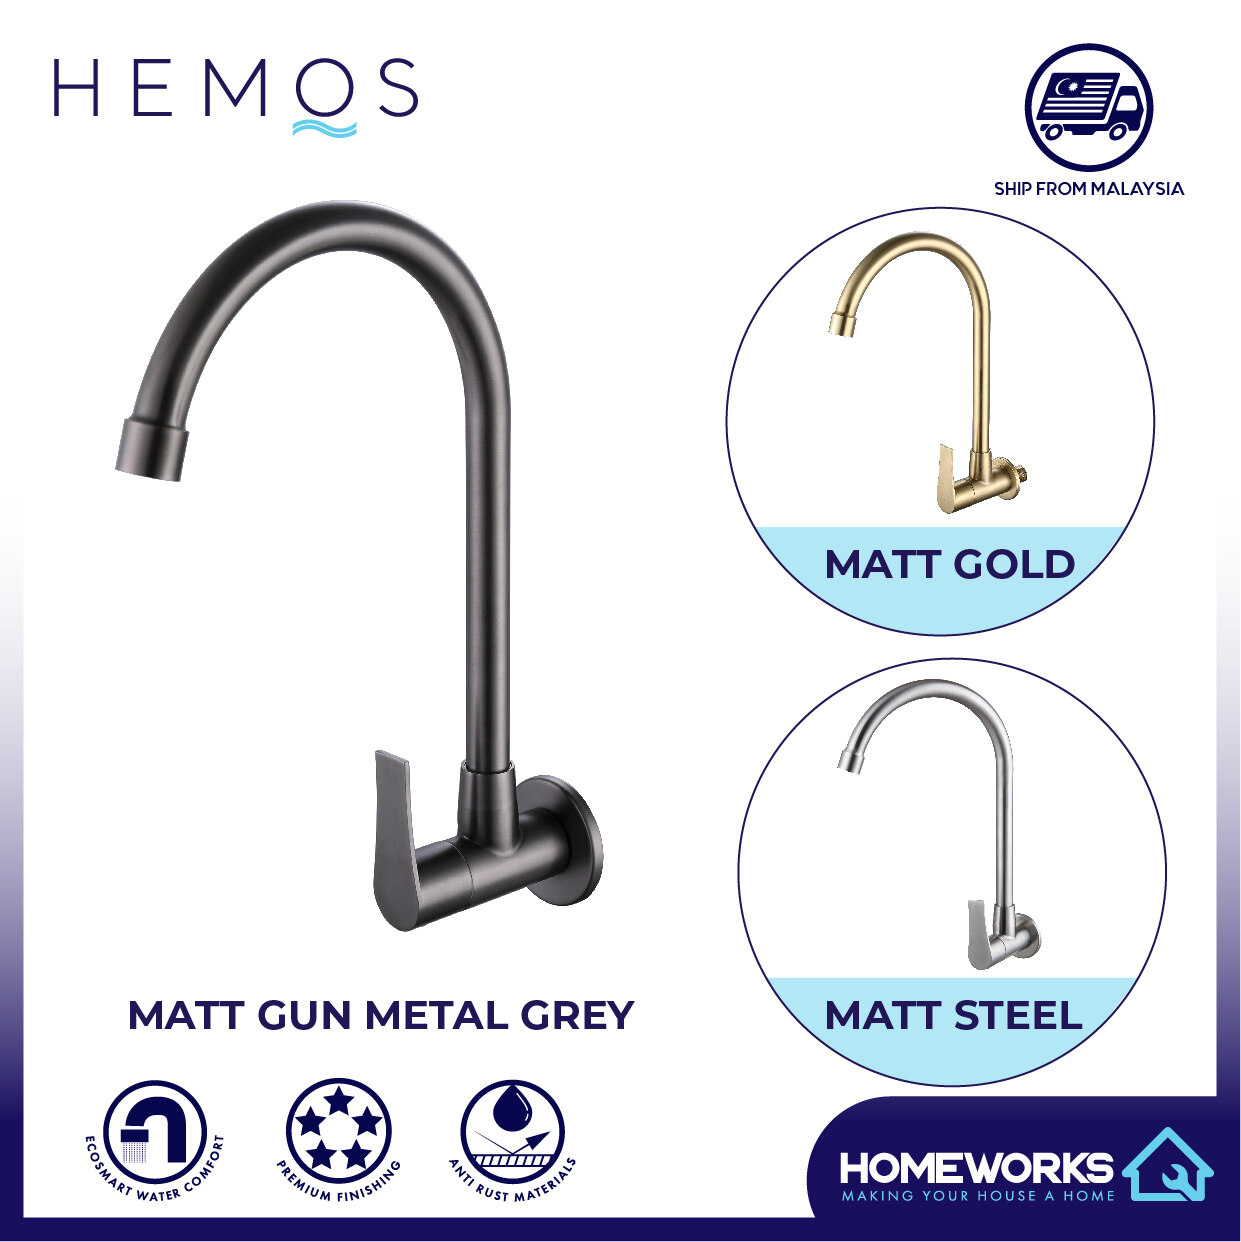 hemos kitchen faucet stainless steel sus 304 wall sink tap hm 3202 gunmetal black gray gold silver